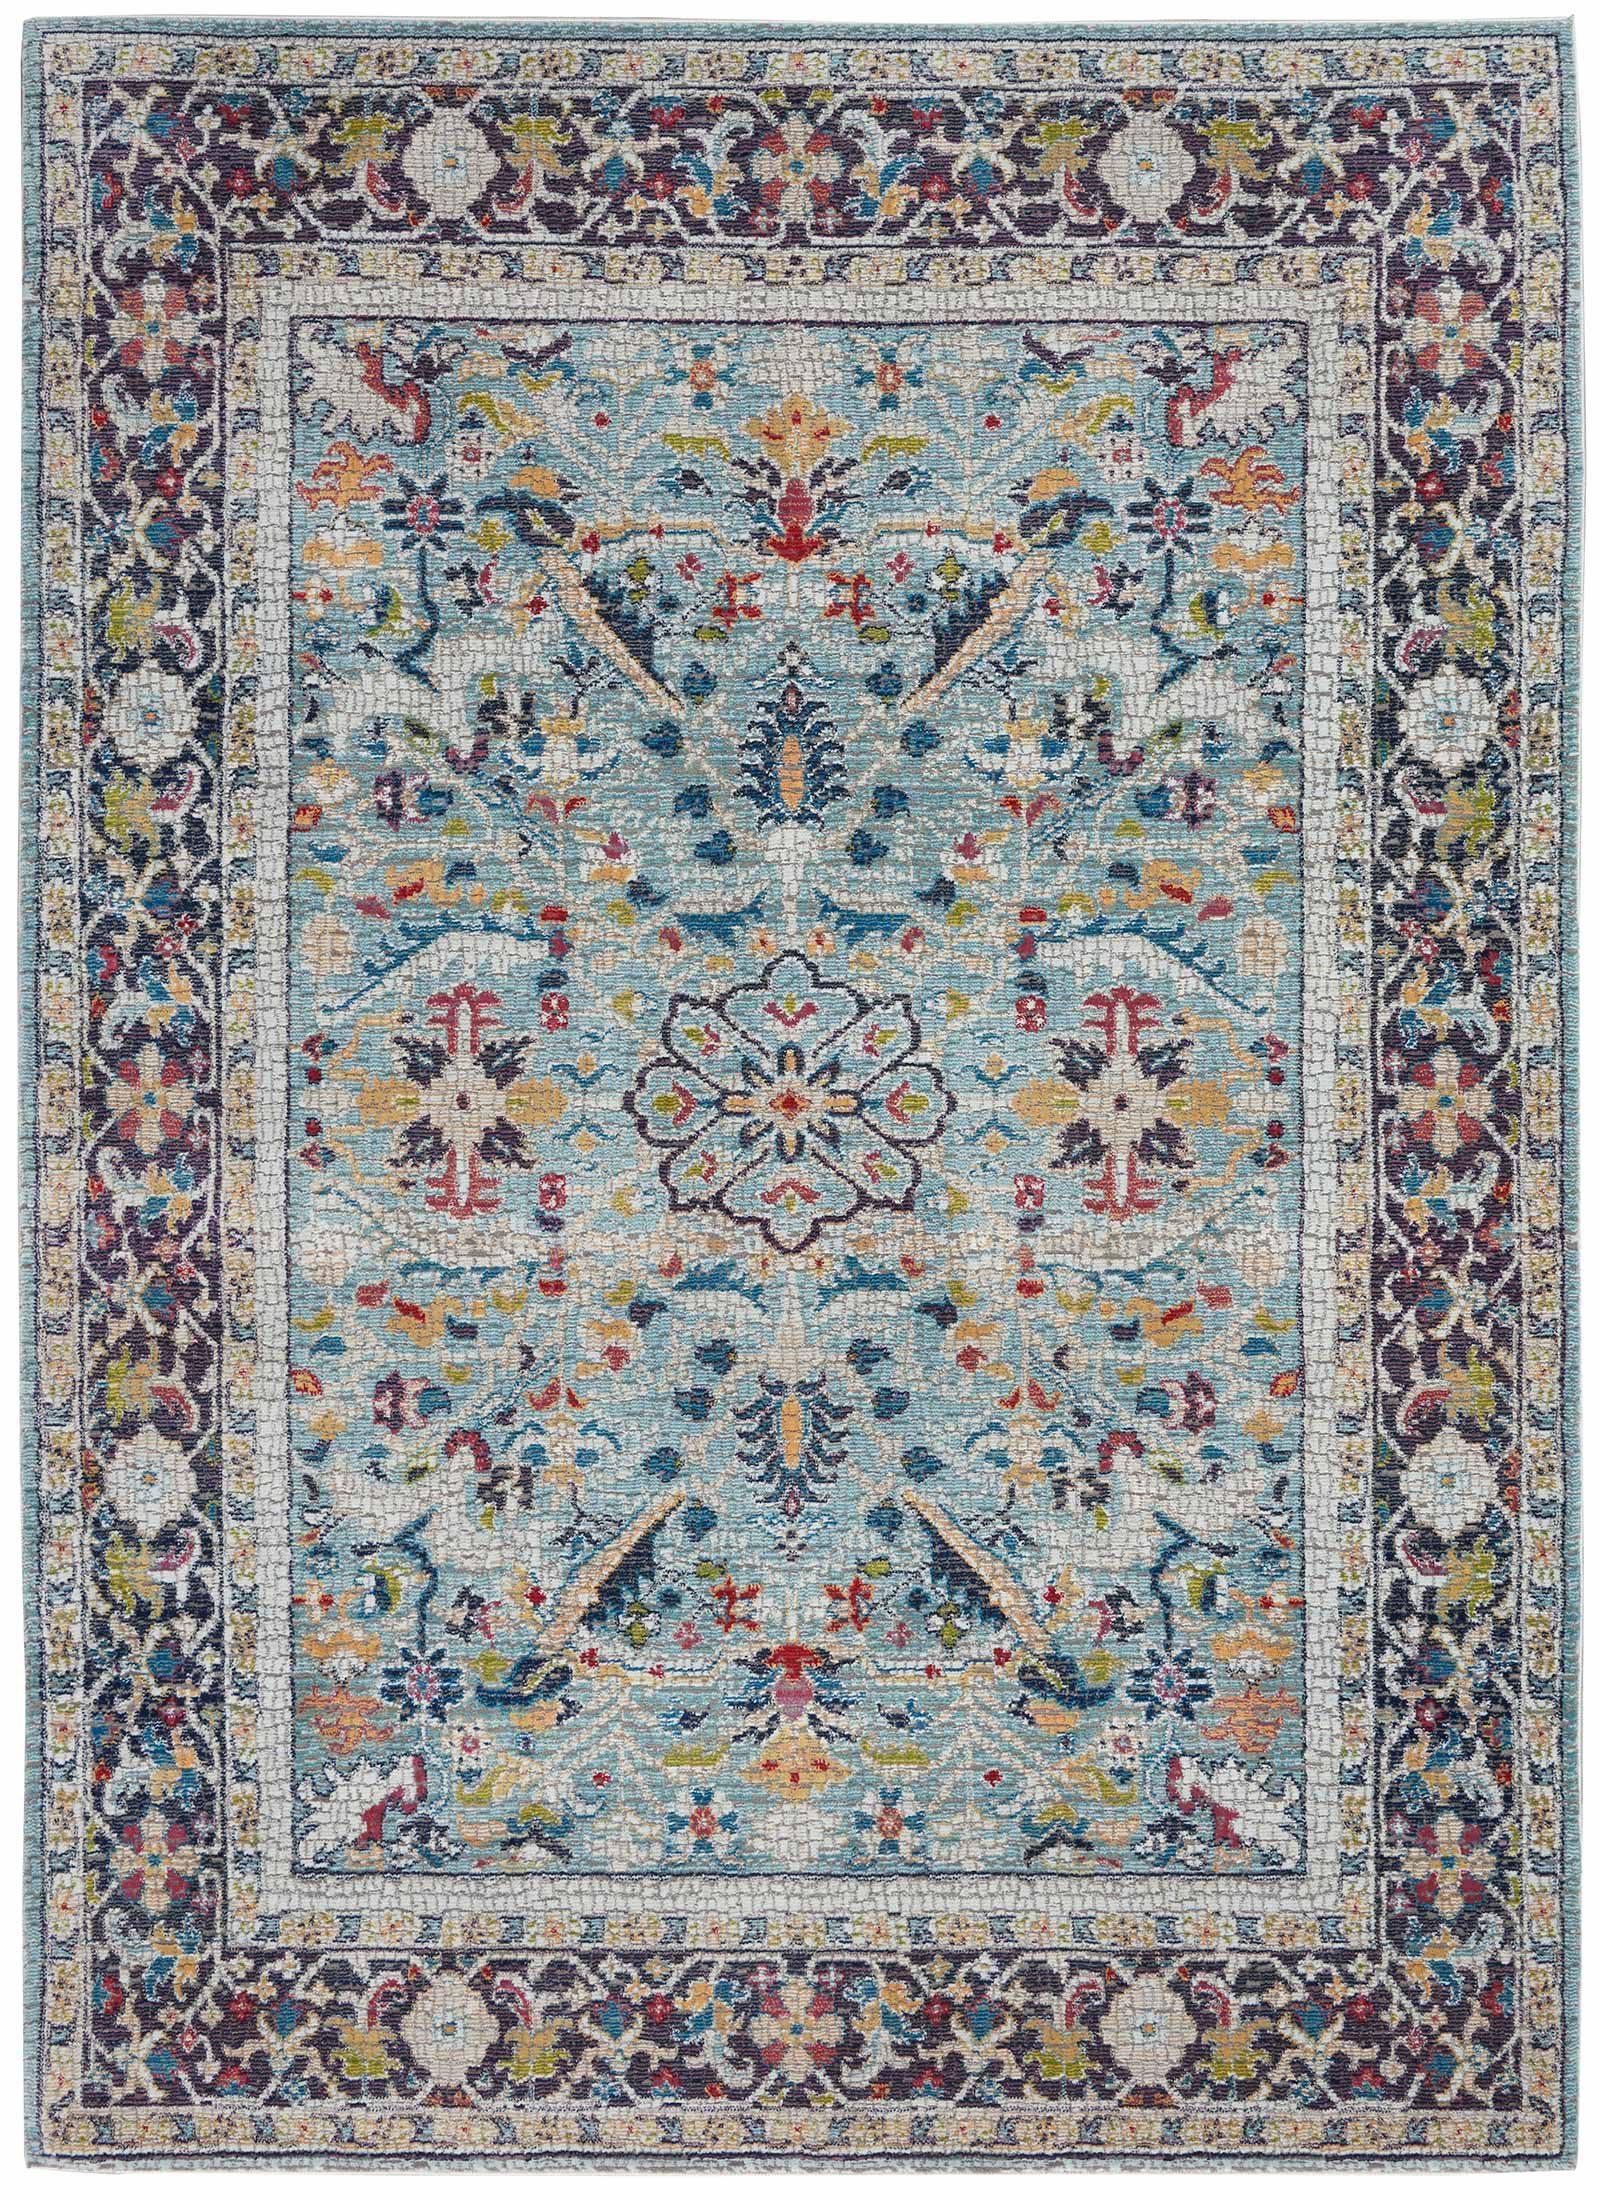 Nourison rug Ankara Global ANR14 TEAL MULTI 5x8 099446498441 flat C